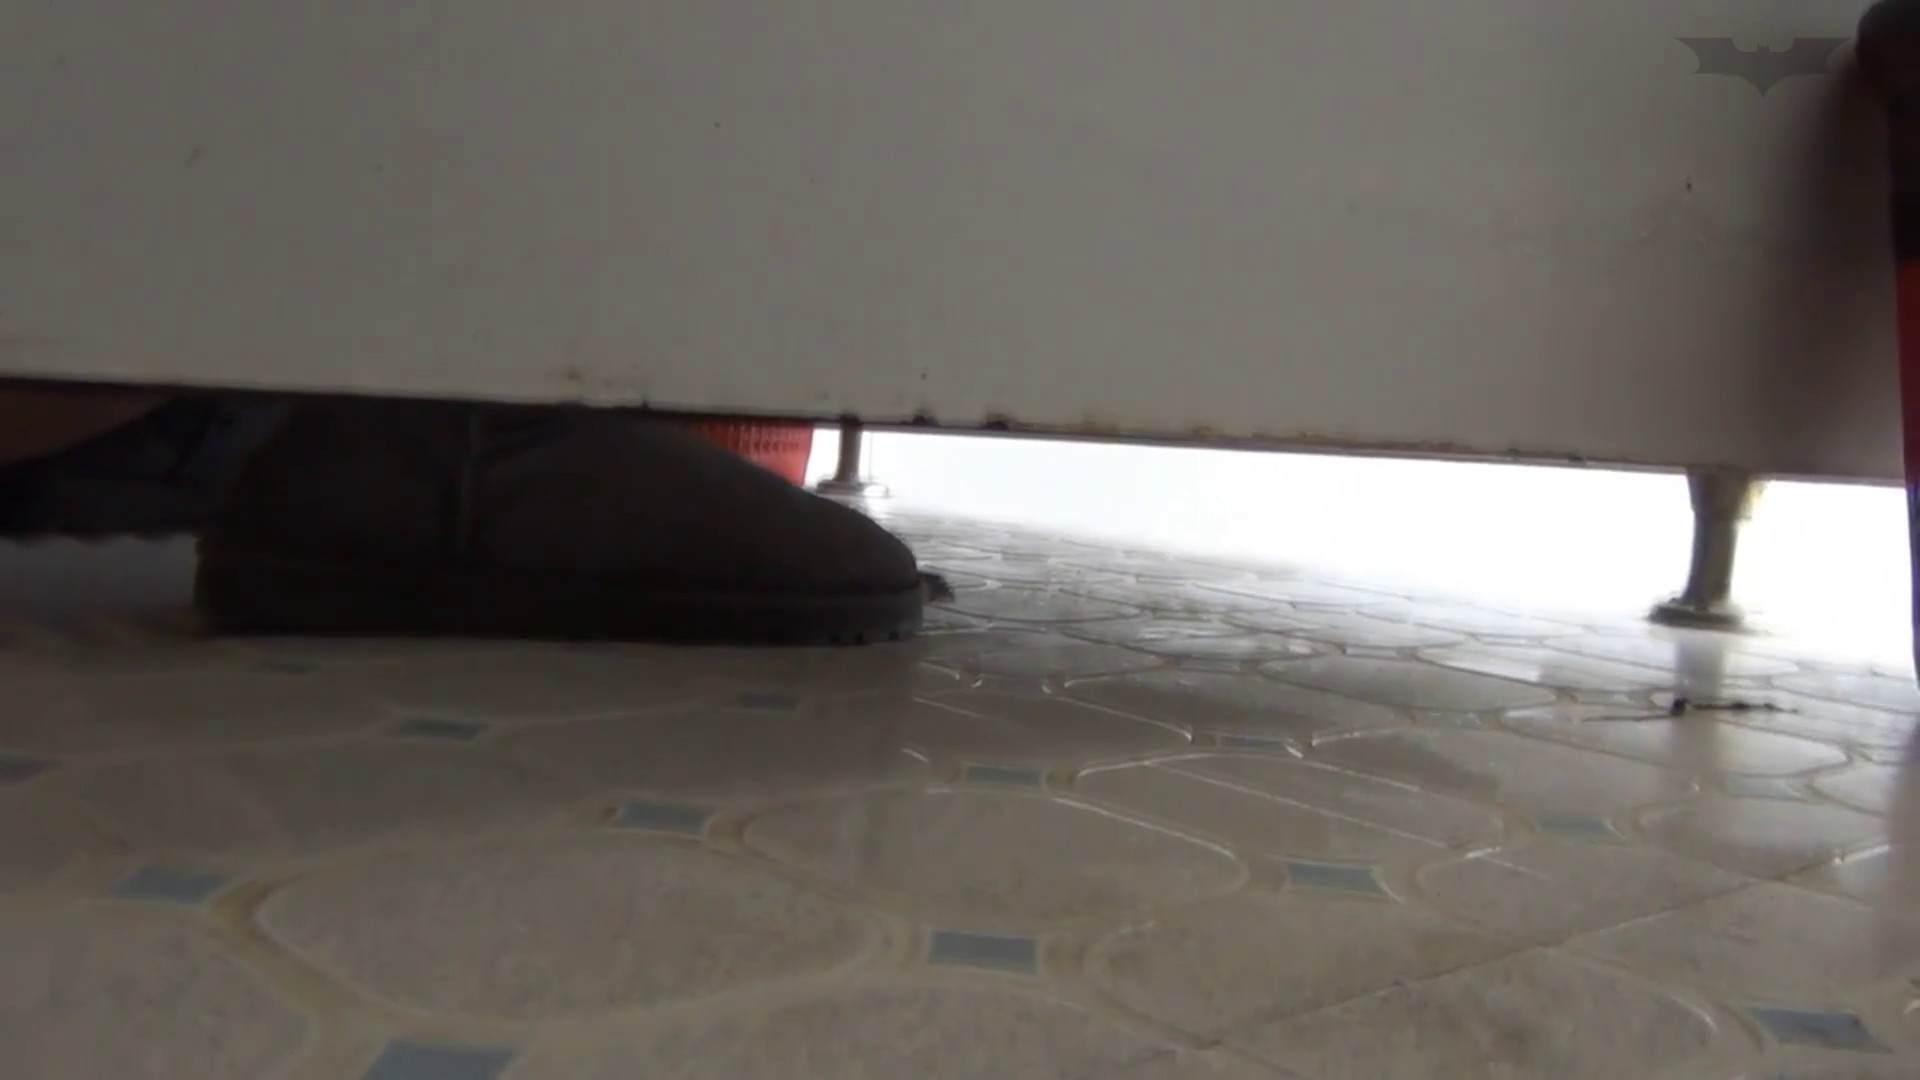 JD盗撮 美女の洗面所の秘密 Vol.55 トイレの実態 オマンコ無修正動画無料 82PIX 4